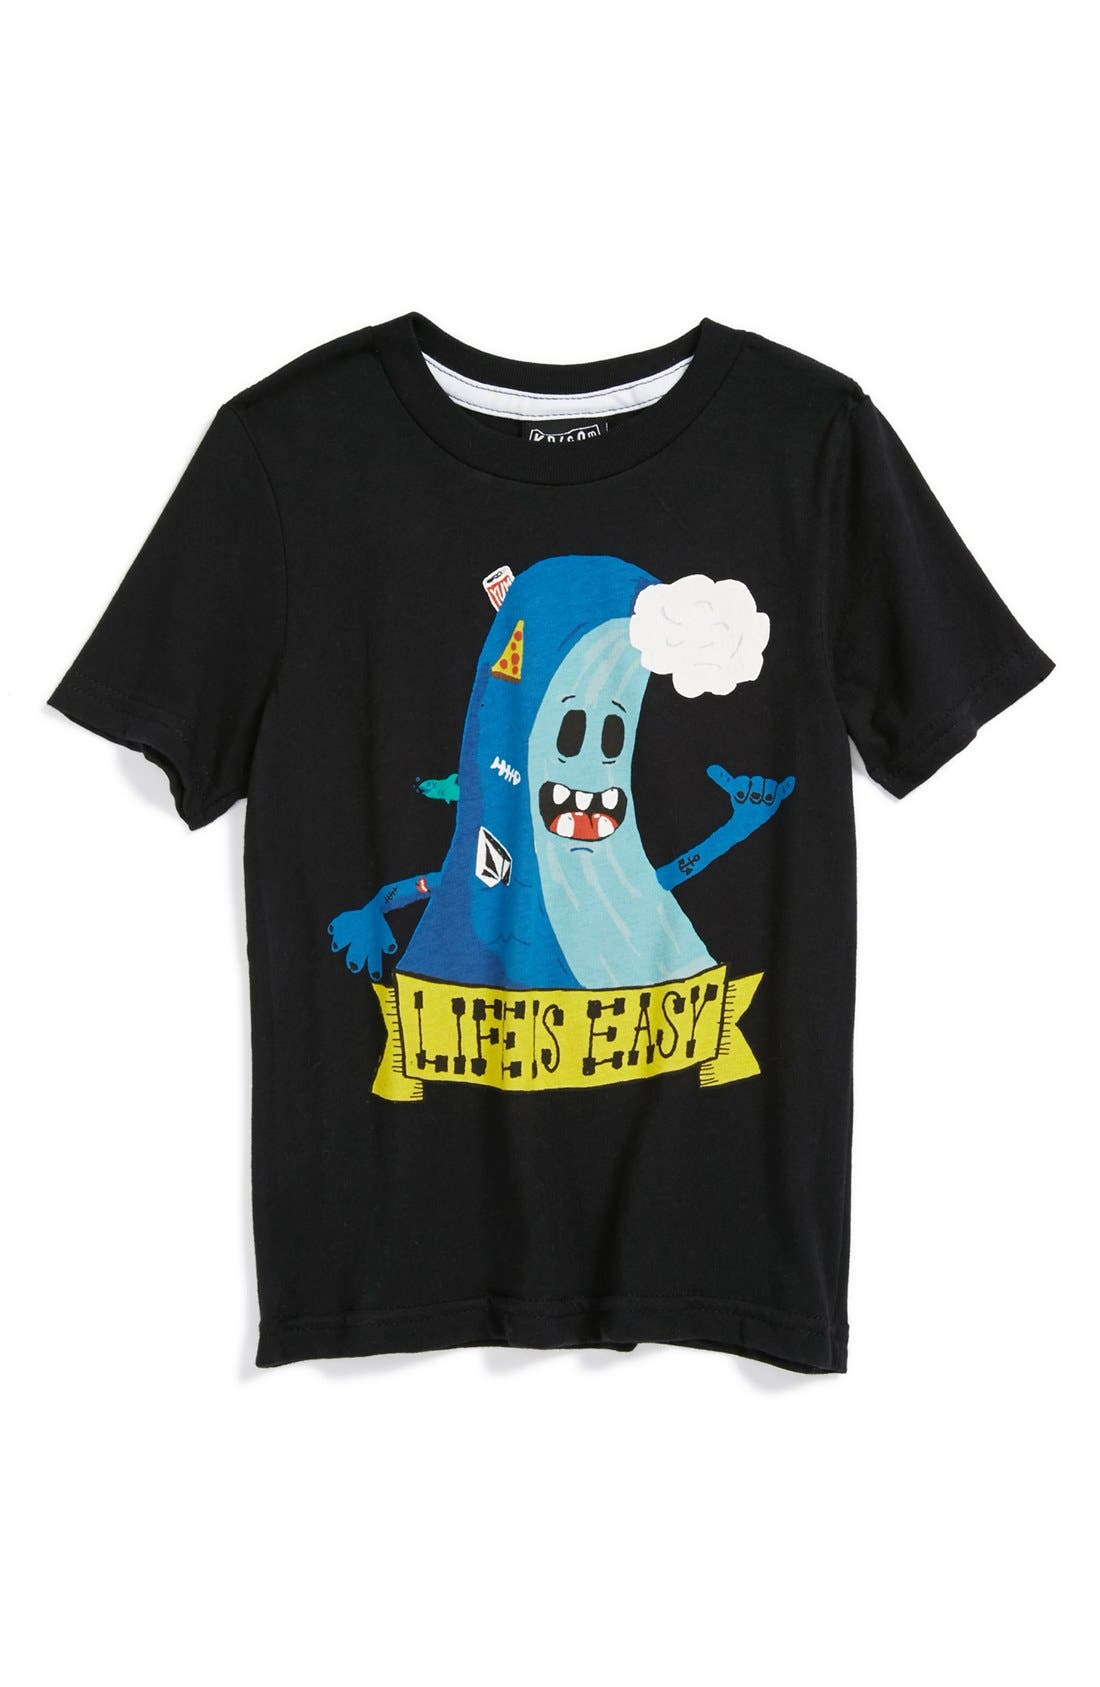 Alternate Image 1 Selected - Volcom 'Patrick Carrie' T-Shirt (Toddler Boys)